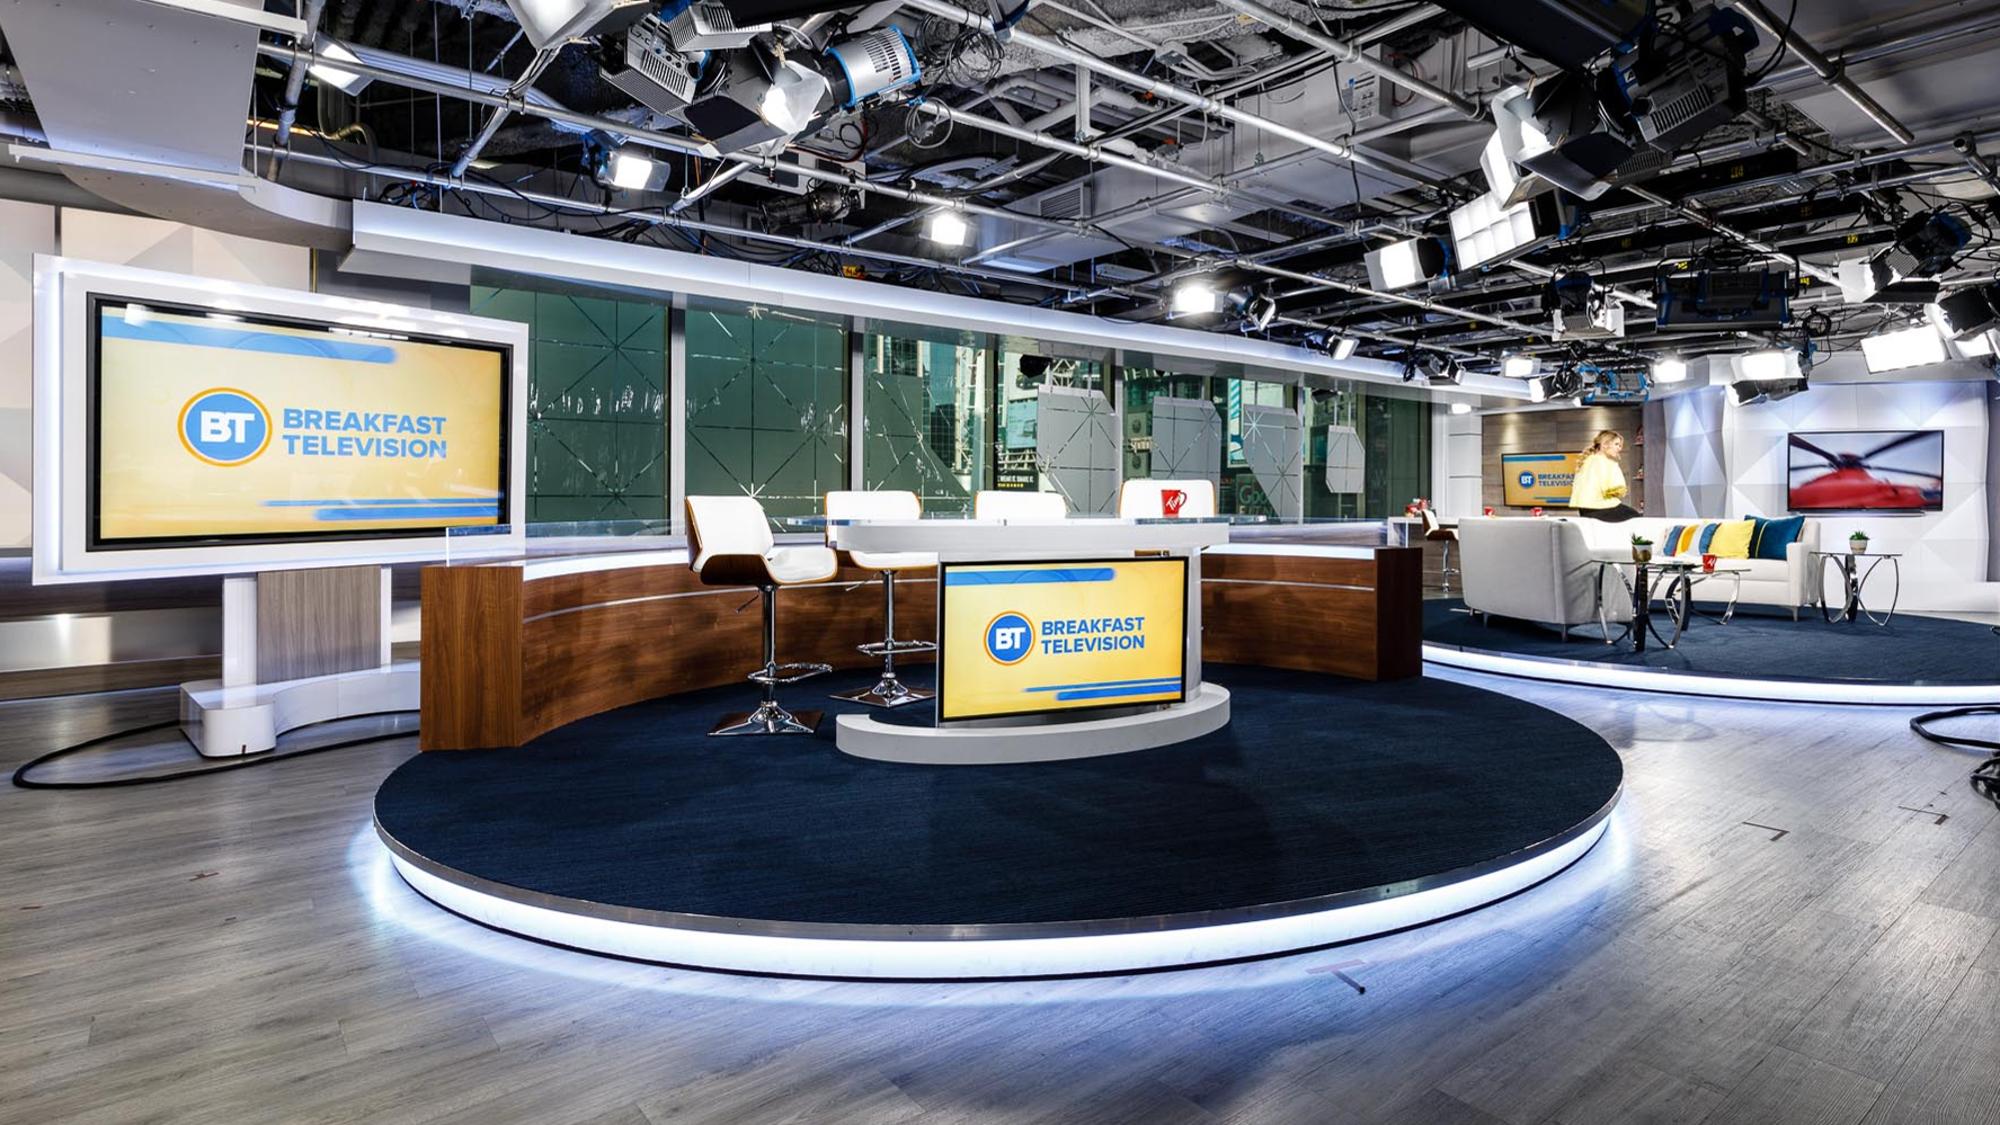 ncs_bt-breakfast-television-canada-tv-studio_0003